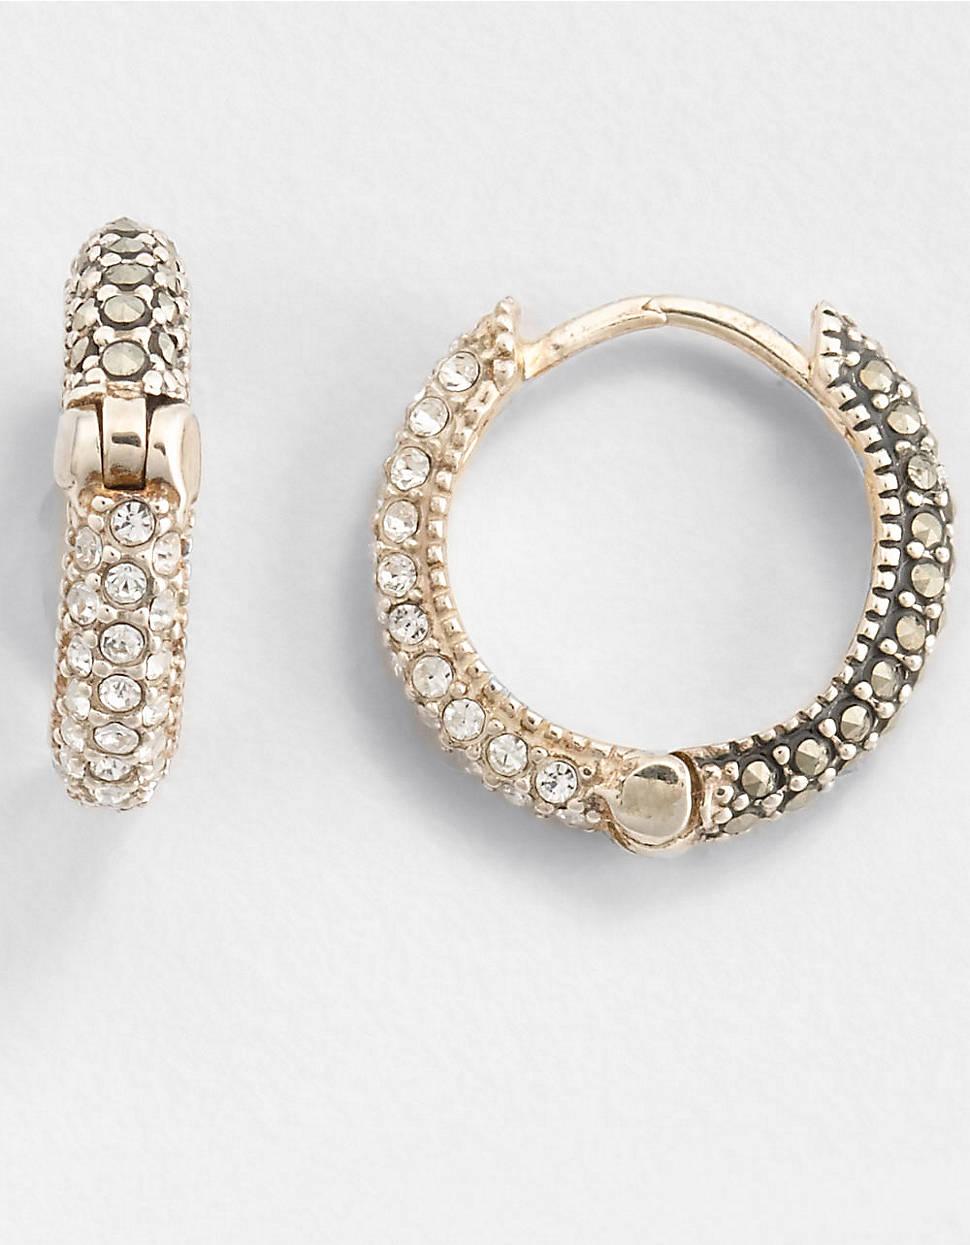 c316936e4 Judith Jack Marcasite Huggie Hoop Earrings in Metallic - Lyst